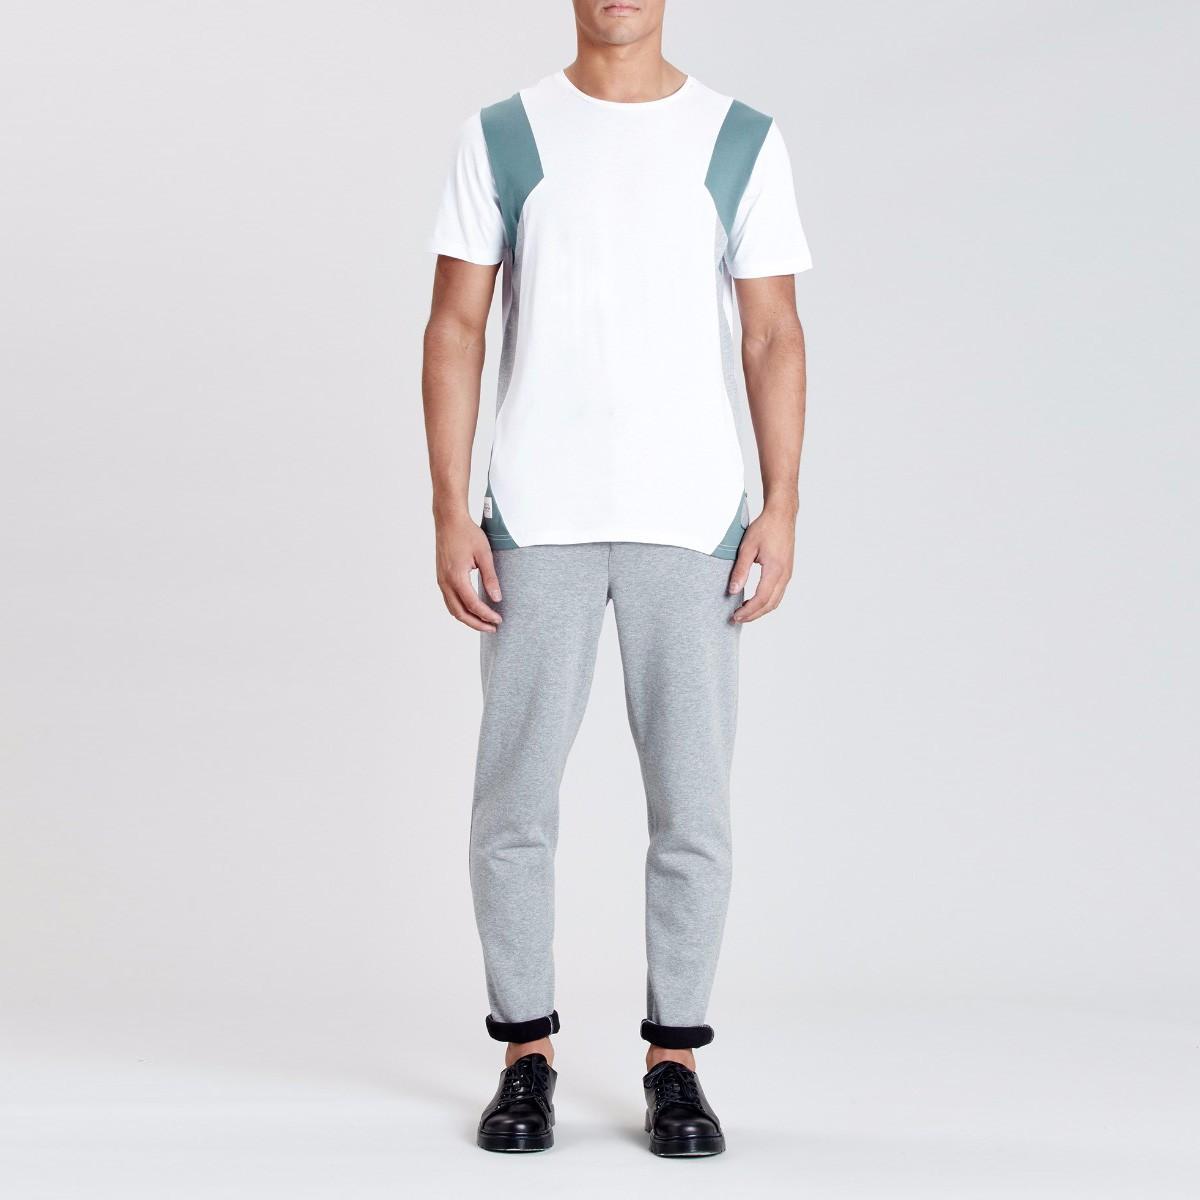 Bílé tričko – Delaware – XL